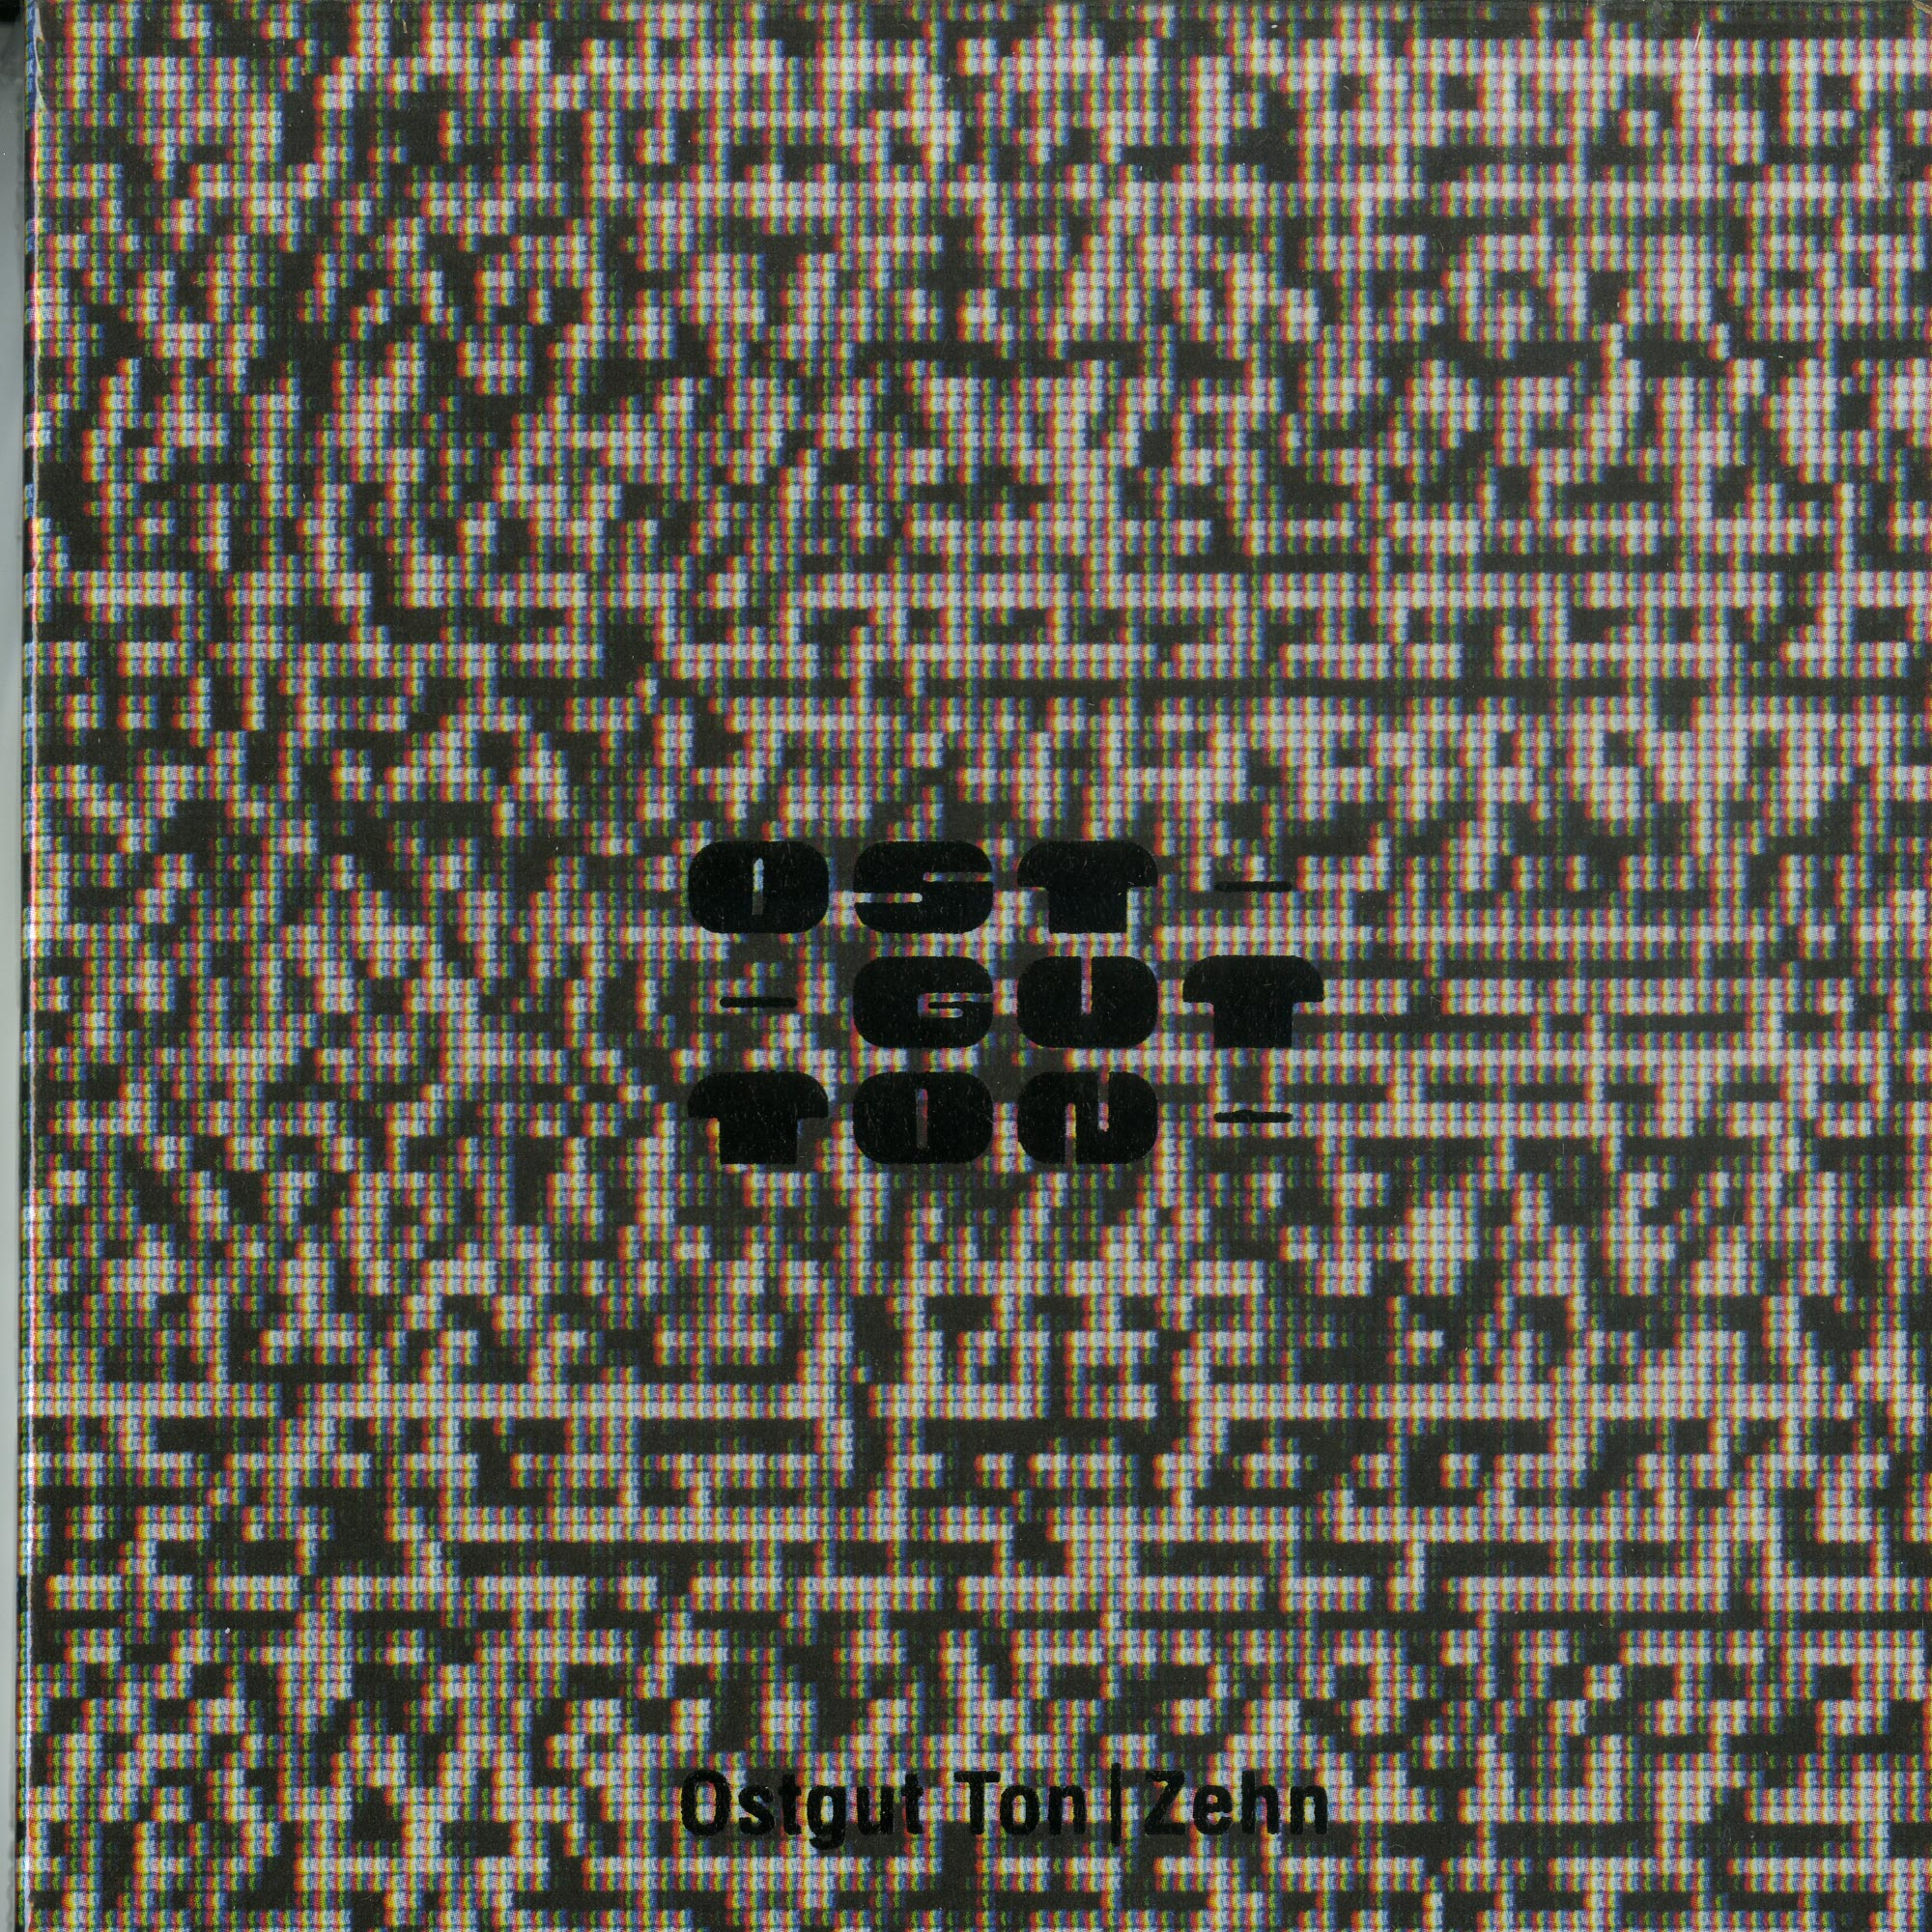 Varioust Artists - OSTGUT TON : ZEHN